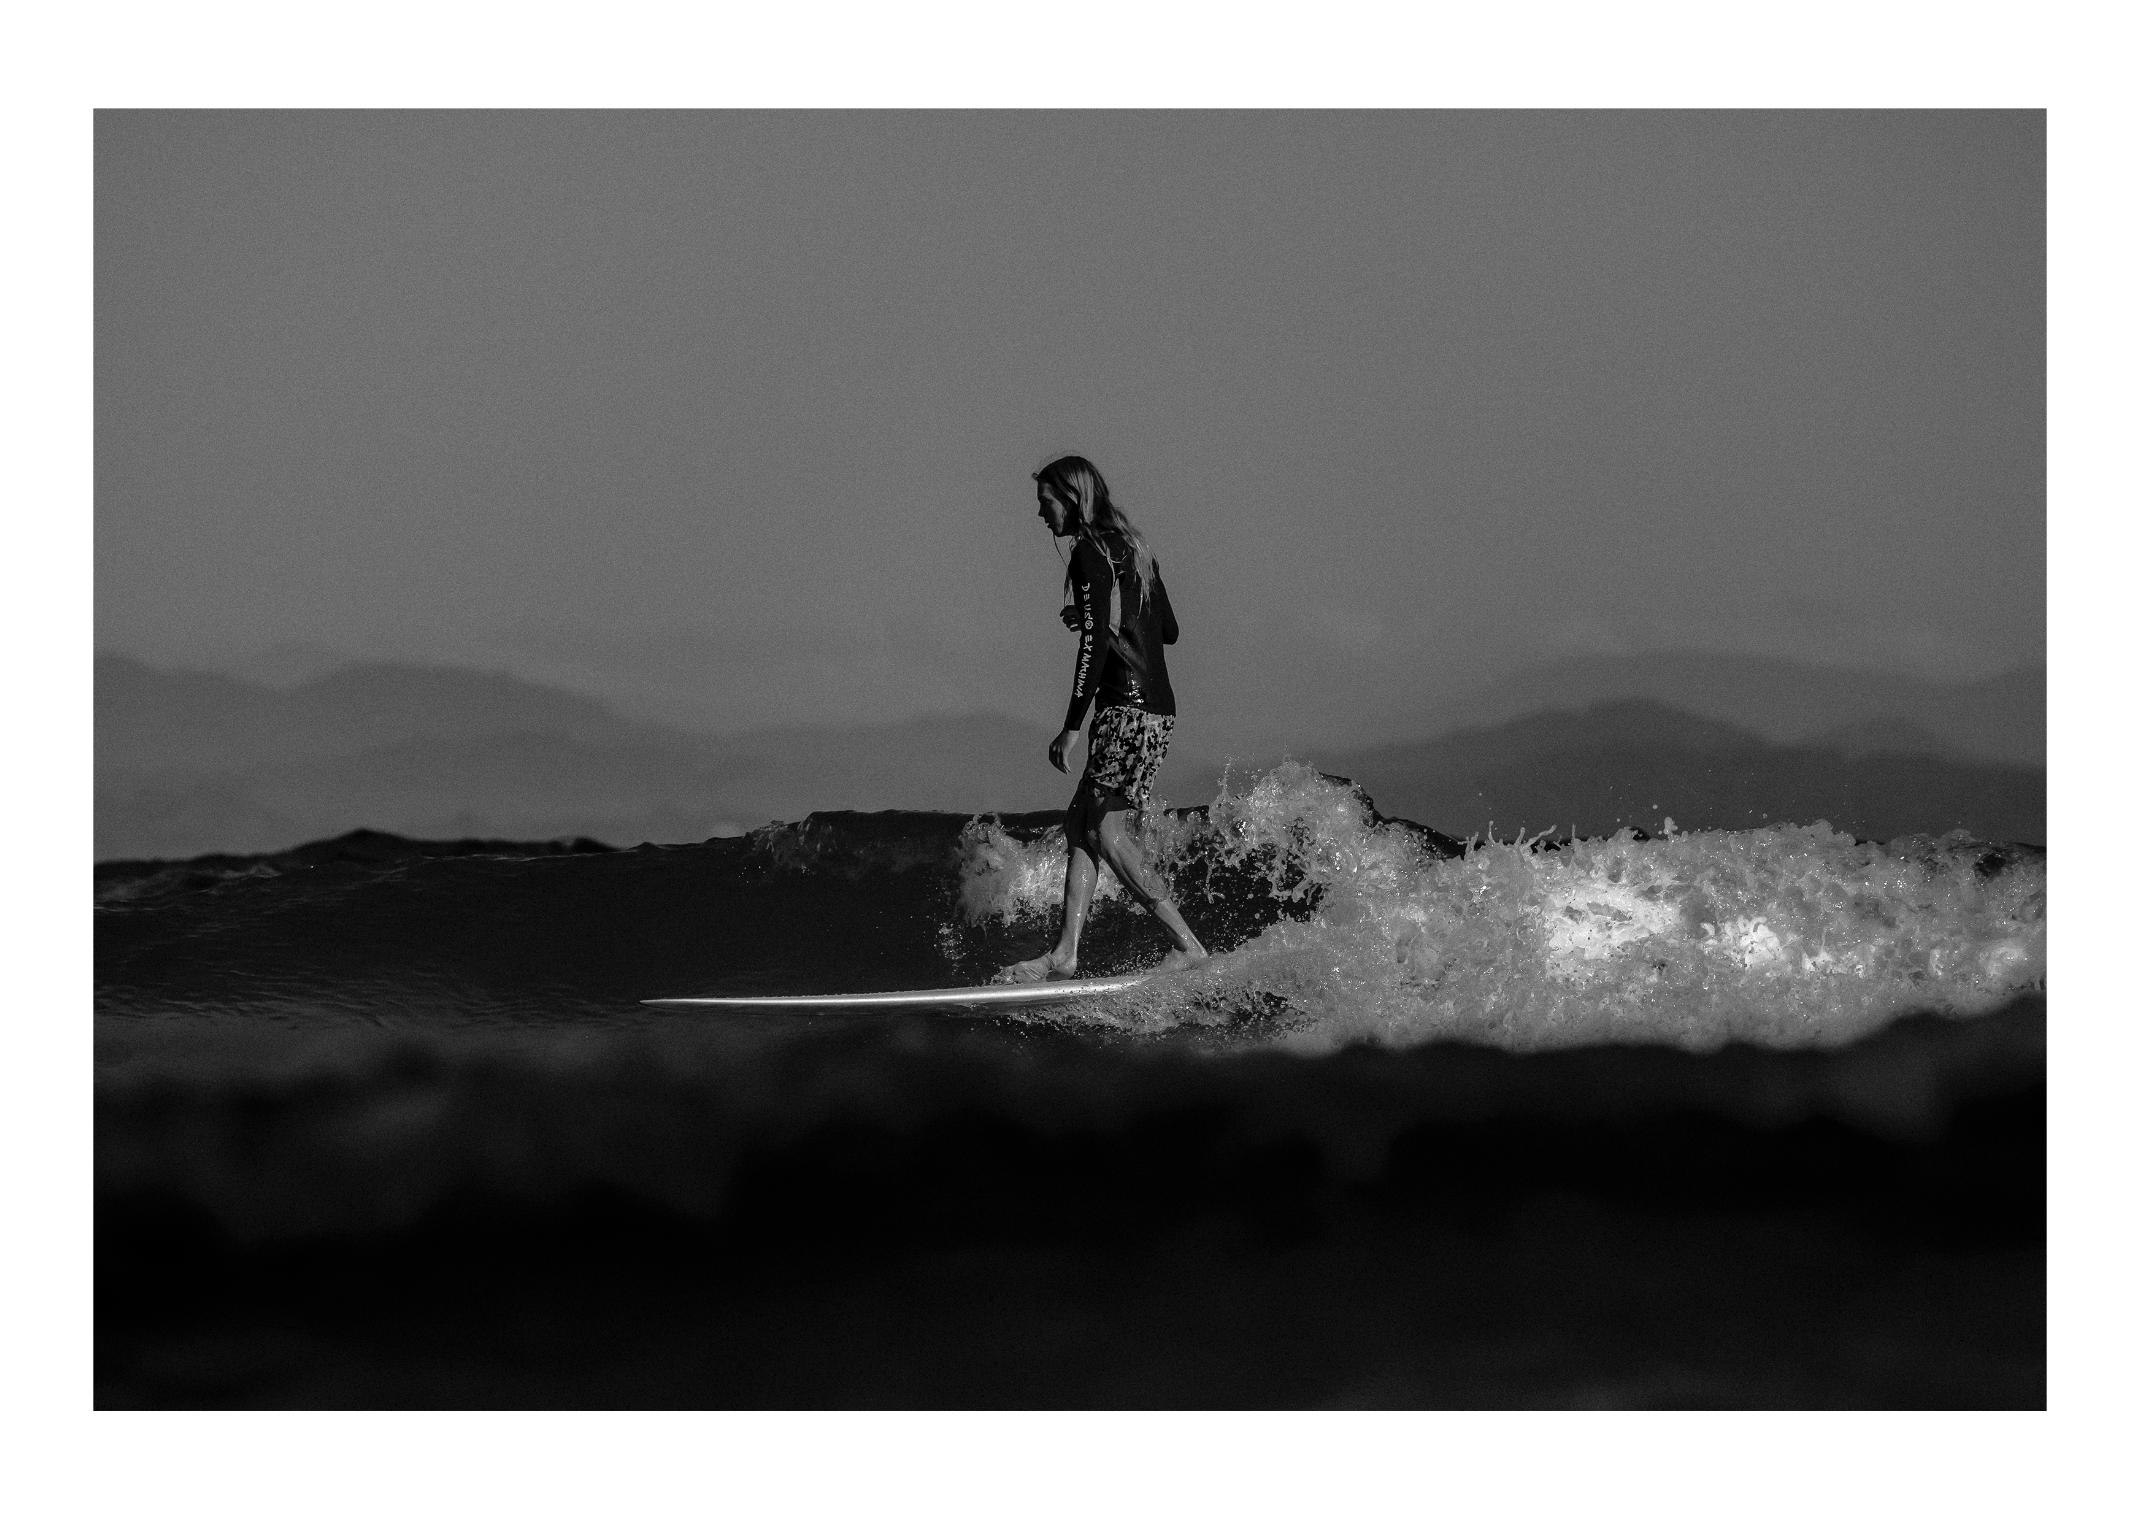 Fabien_voileau_salt_water_byron_bay_surf_Jye_whyatt_8